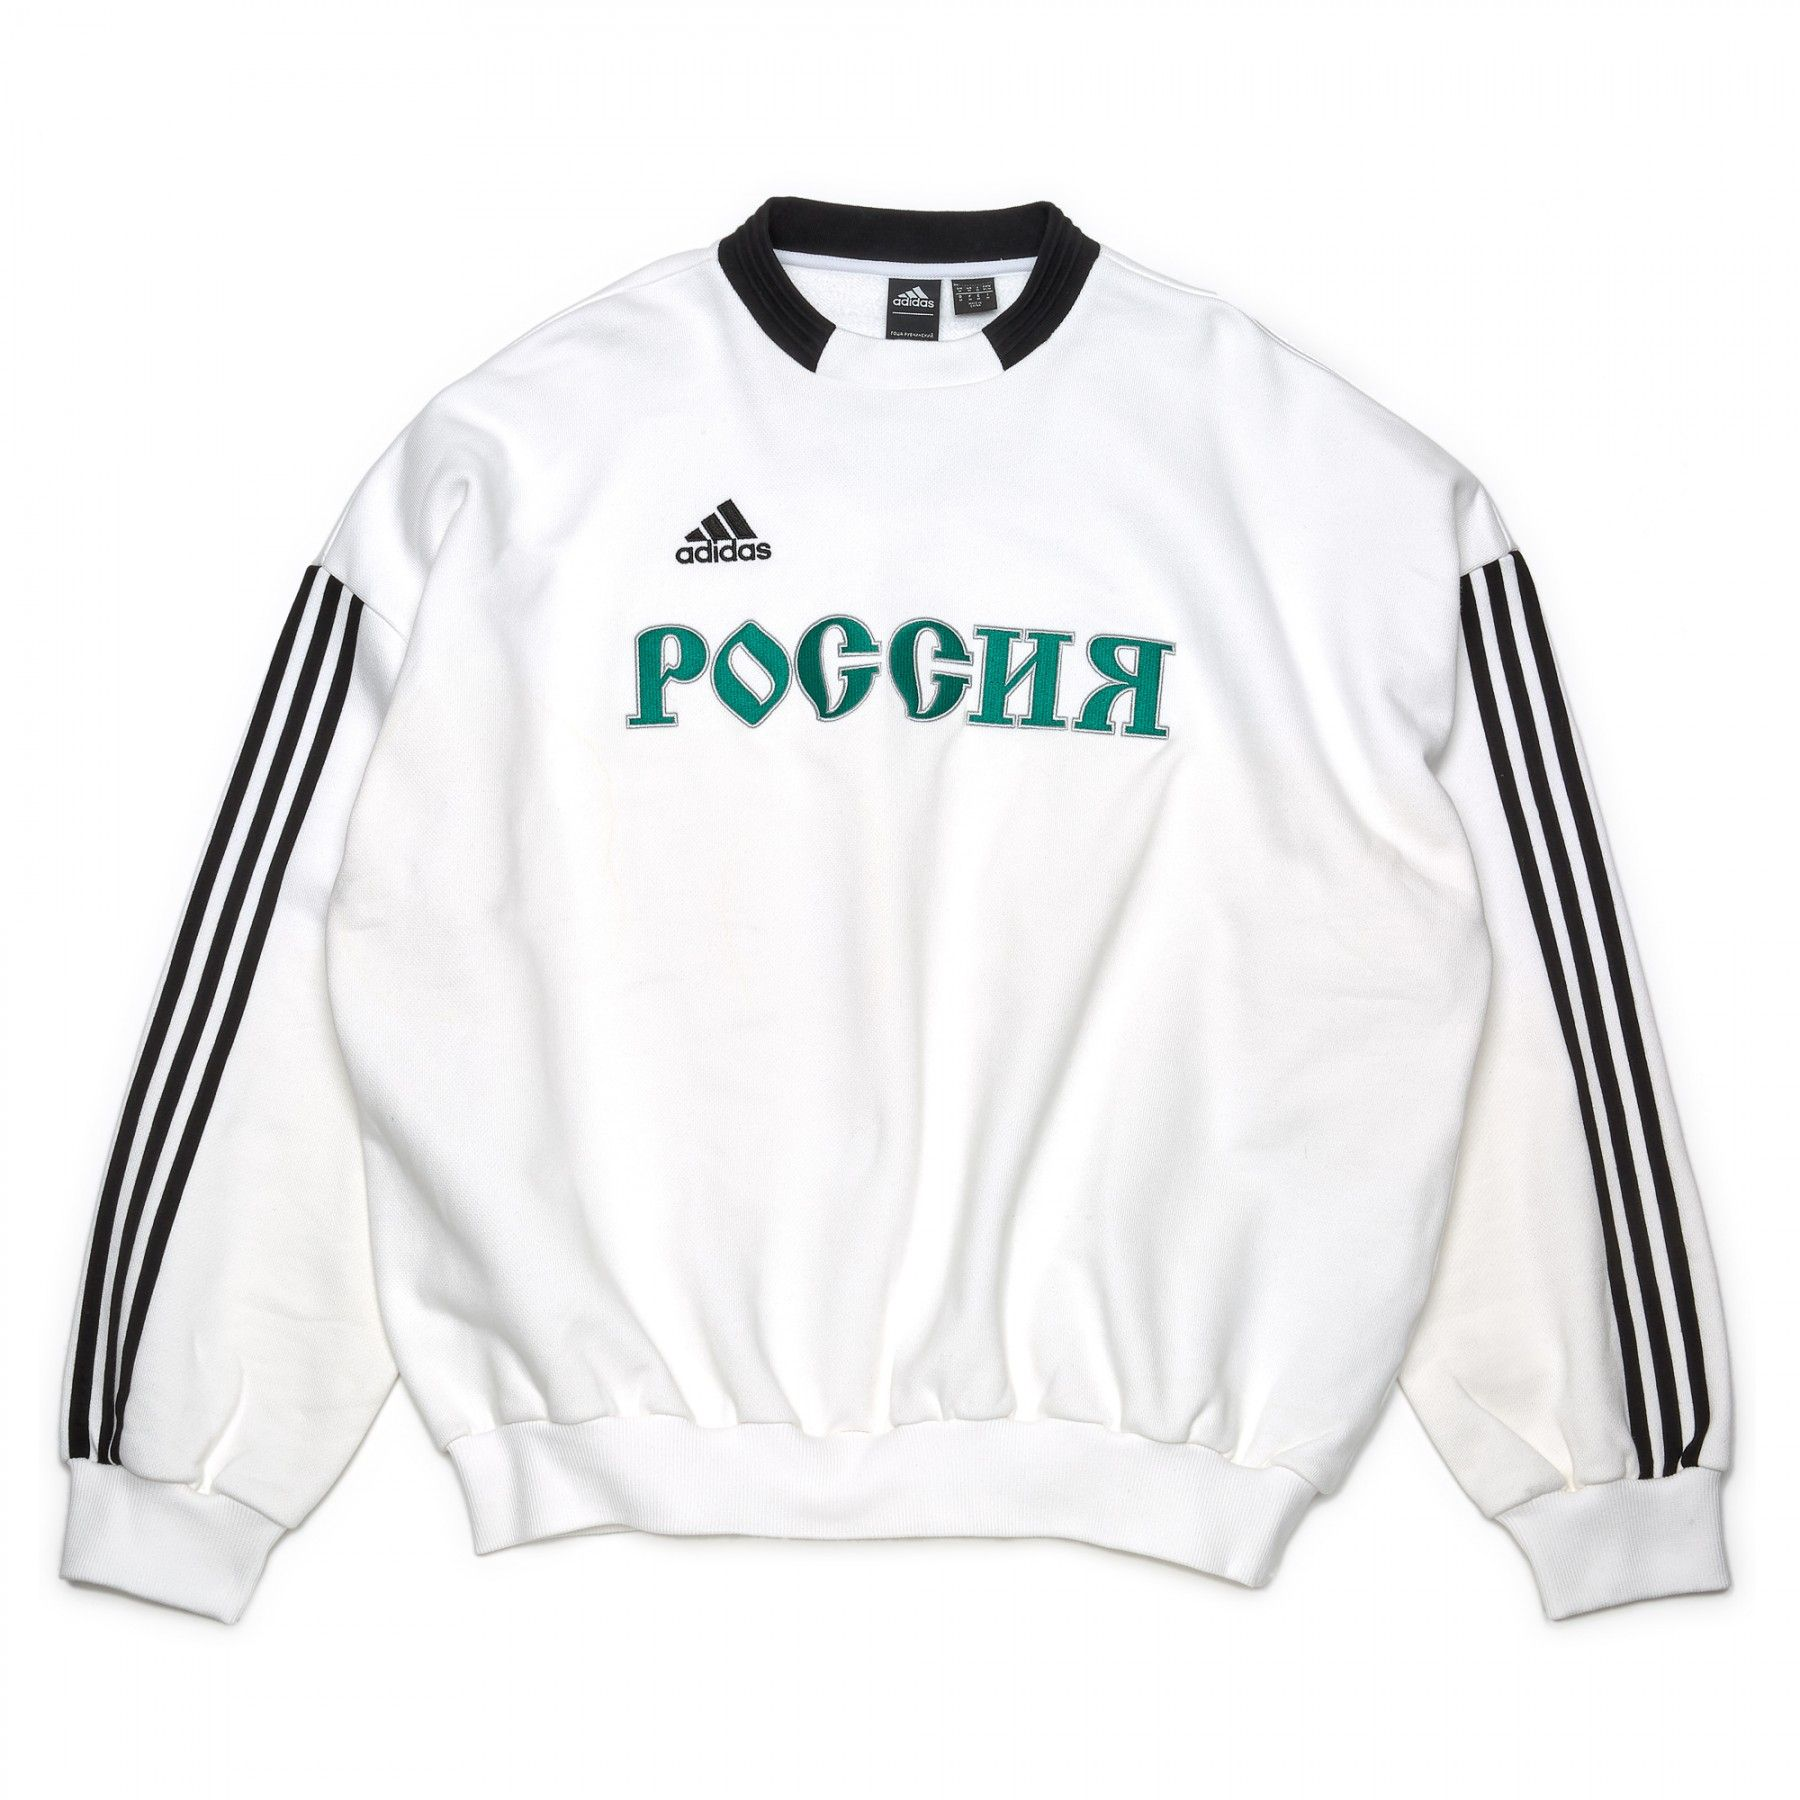 Gosha Rubchinskiy Adidas Sweat Top White [ 1800 x 1800 Pixel ]